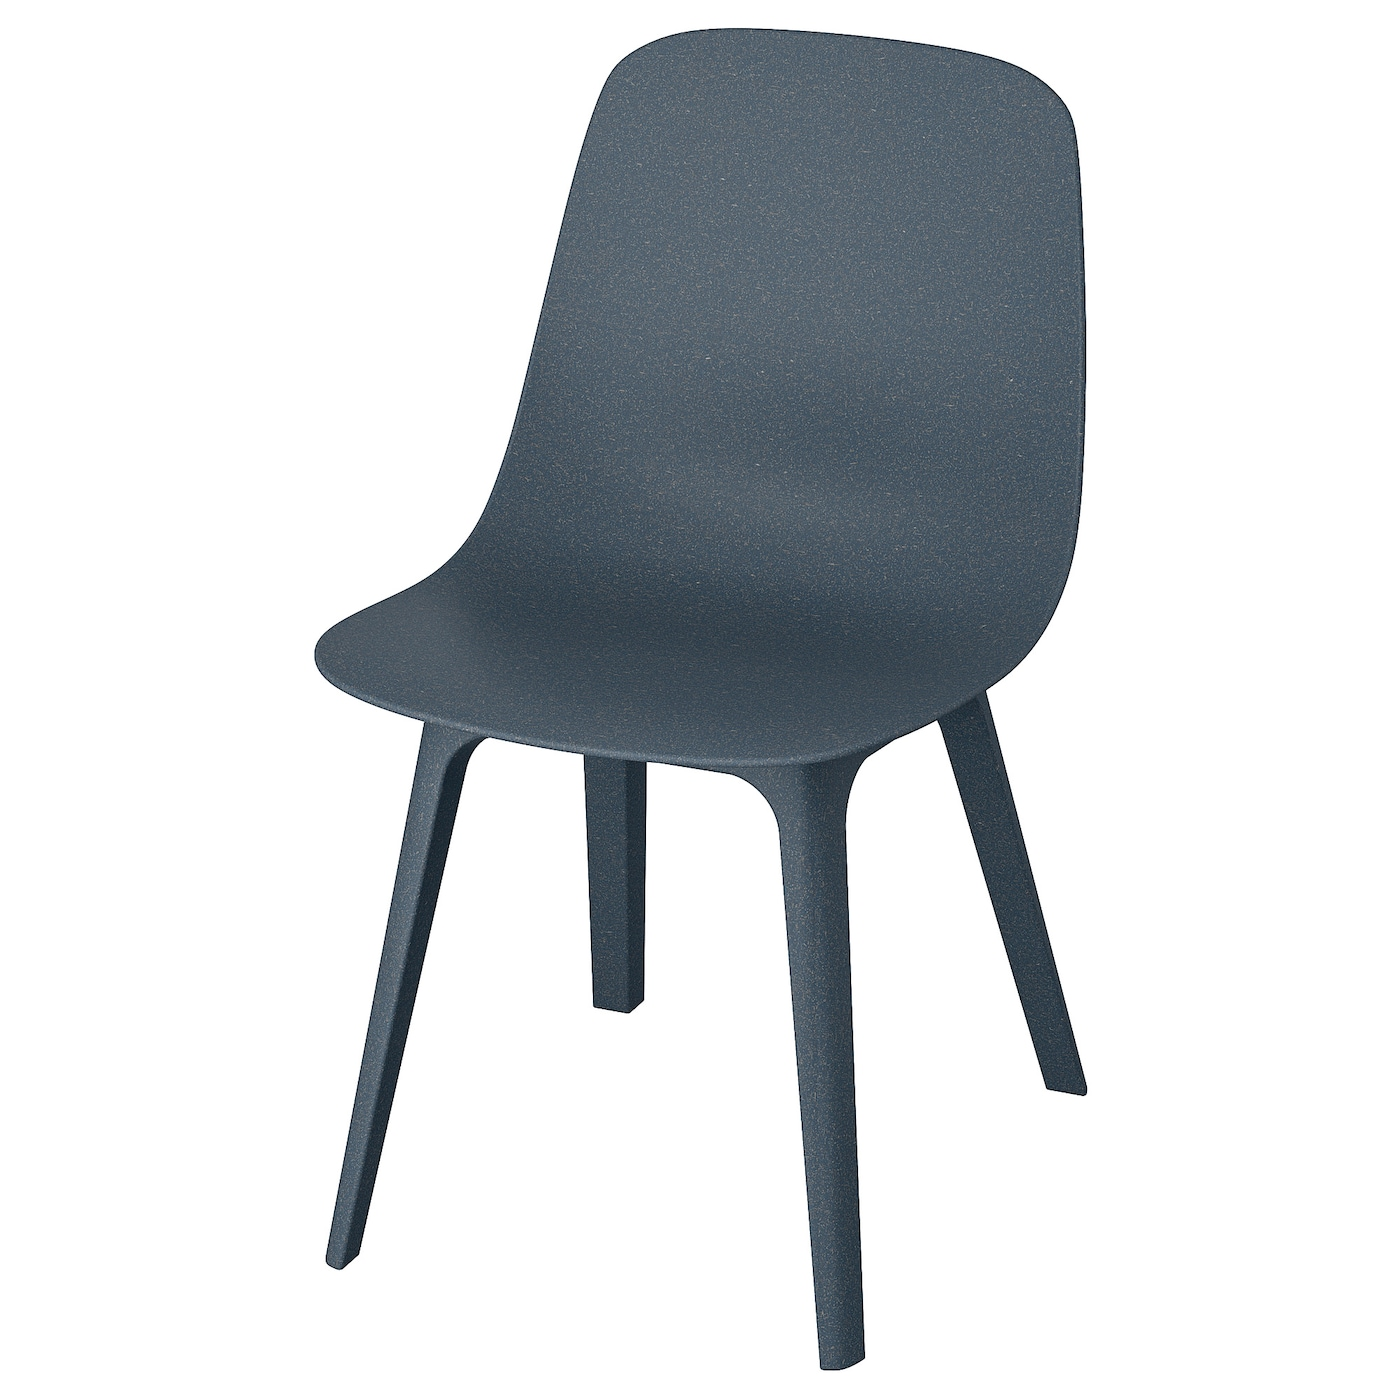 silla odger ikea azul